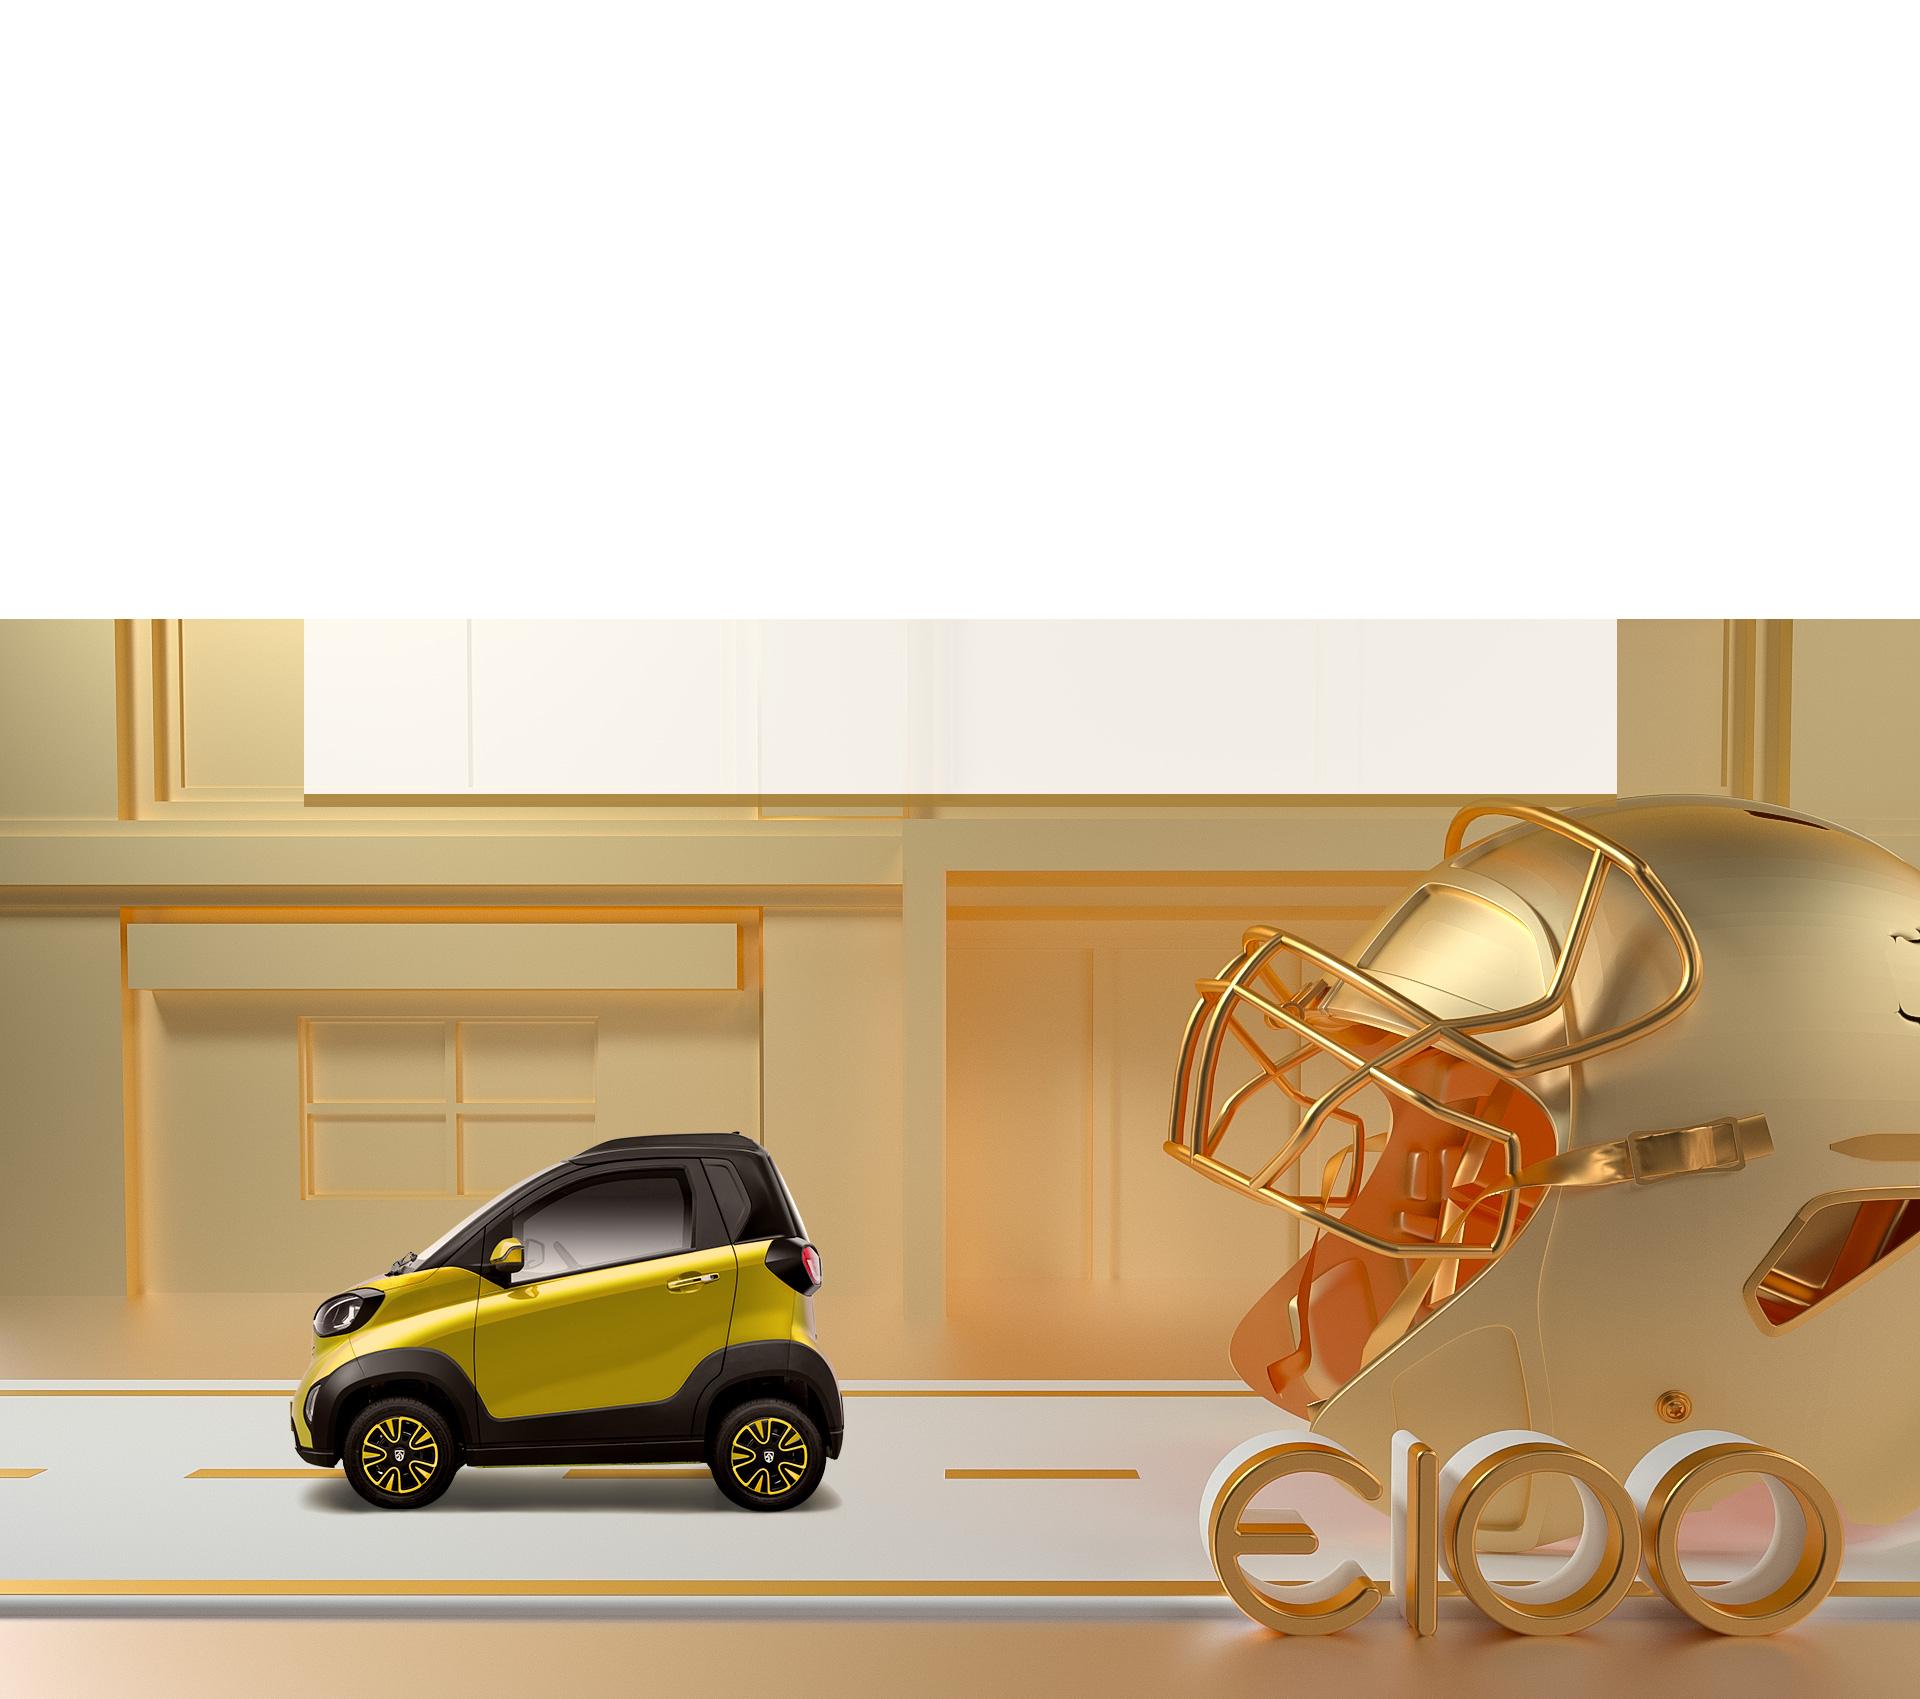 寶(bao)駿E100,電動(dong)汽(qi)車,新能源(yuan)車,車身,充電,品質,安全